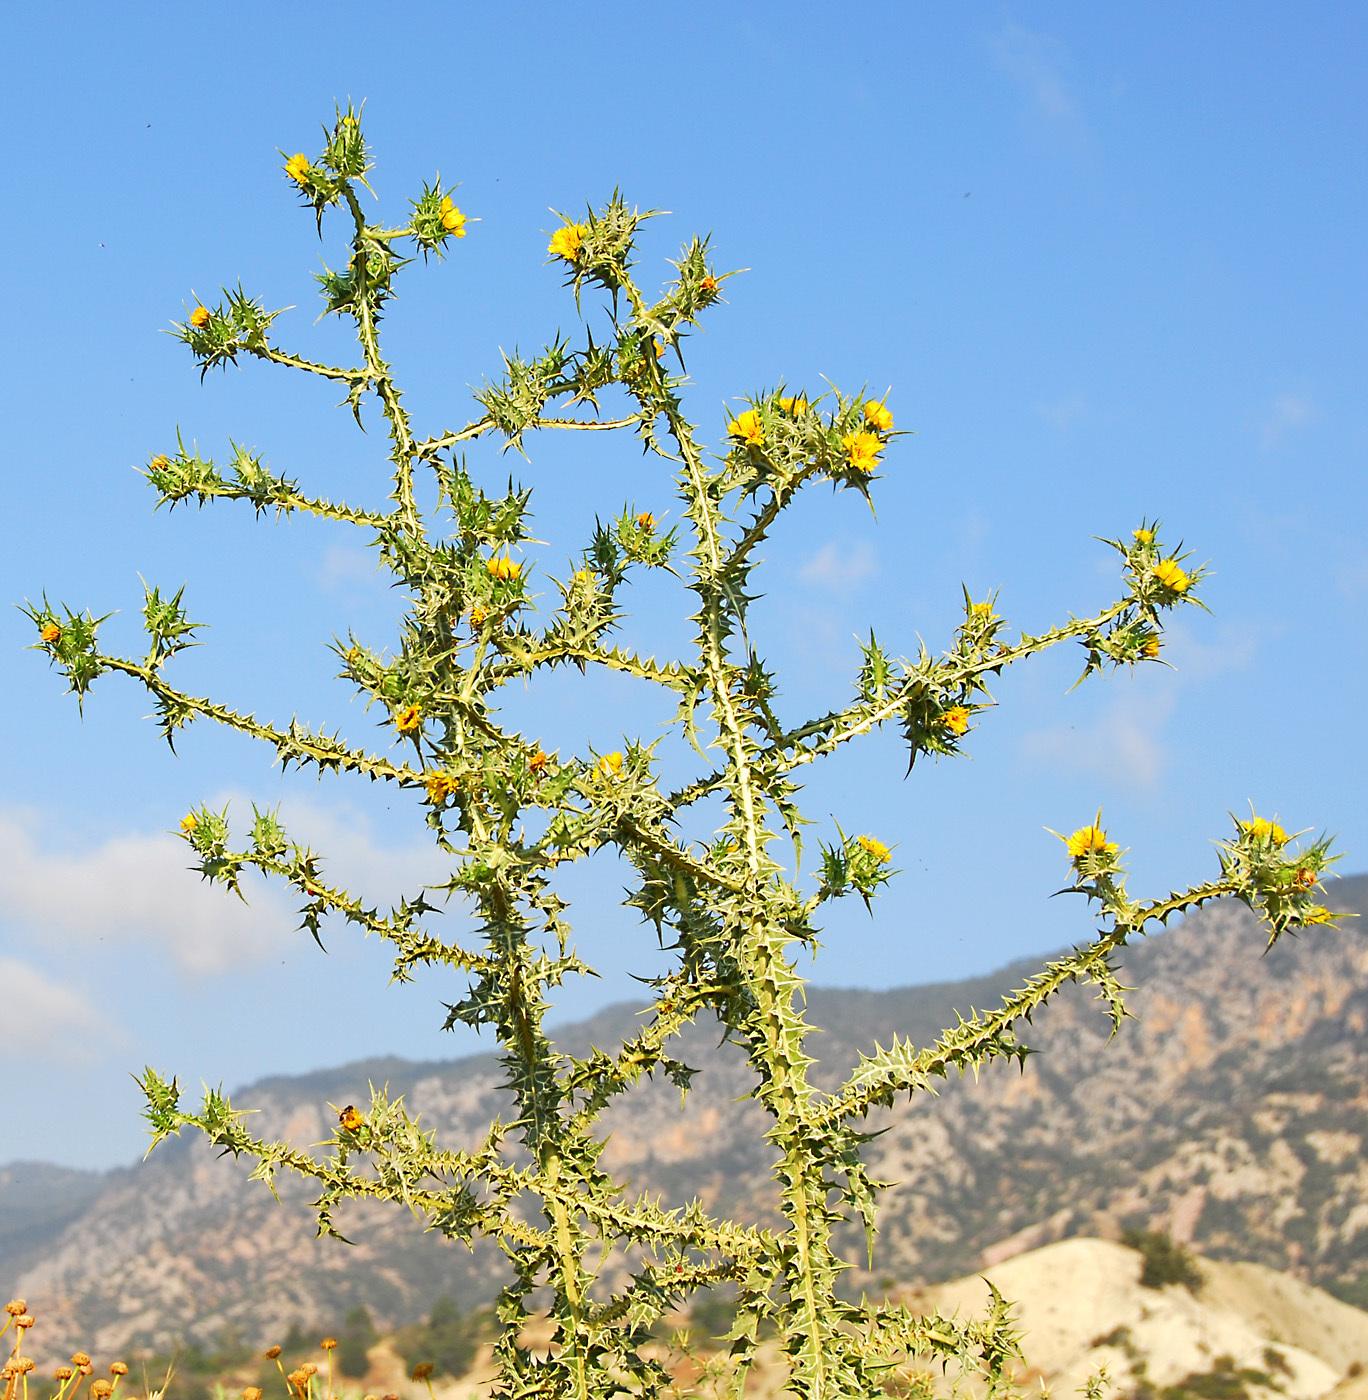 https://pictures.bgbm.org/digilib/Scaler?fn=Cyprus/Scolymus_maculatus_A1.jpg&mo=file